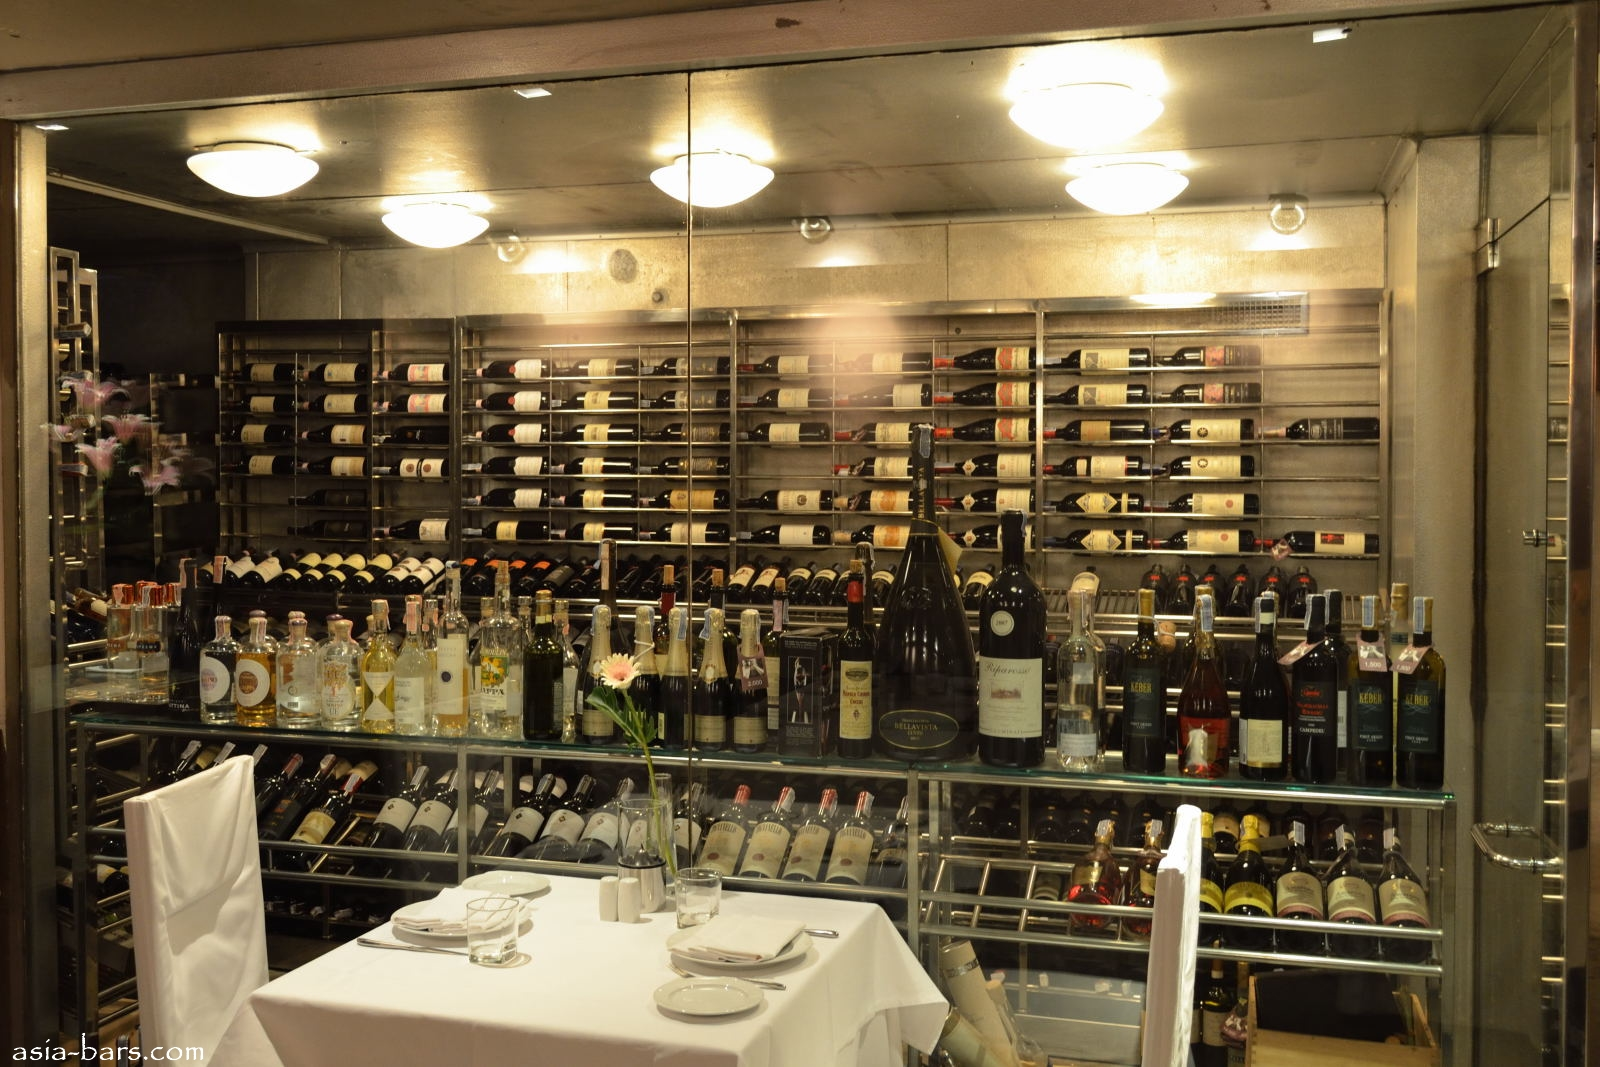 Giusto Restaurant Excelling With Fine Italian Cuisine